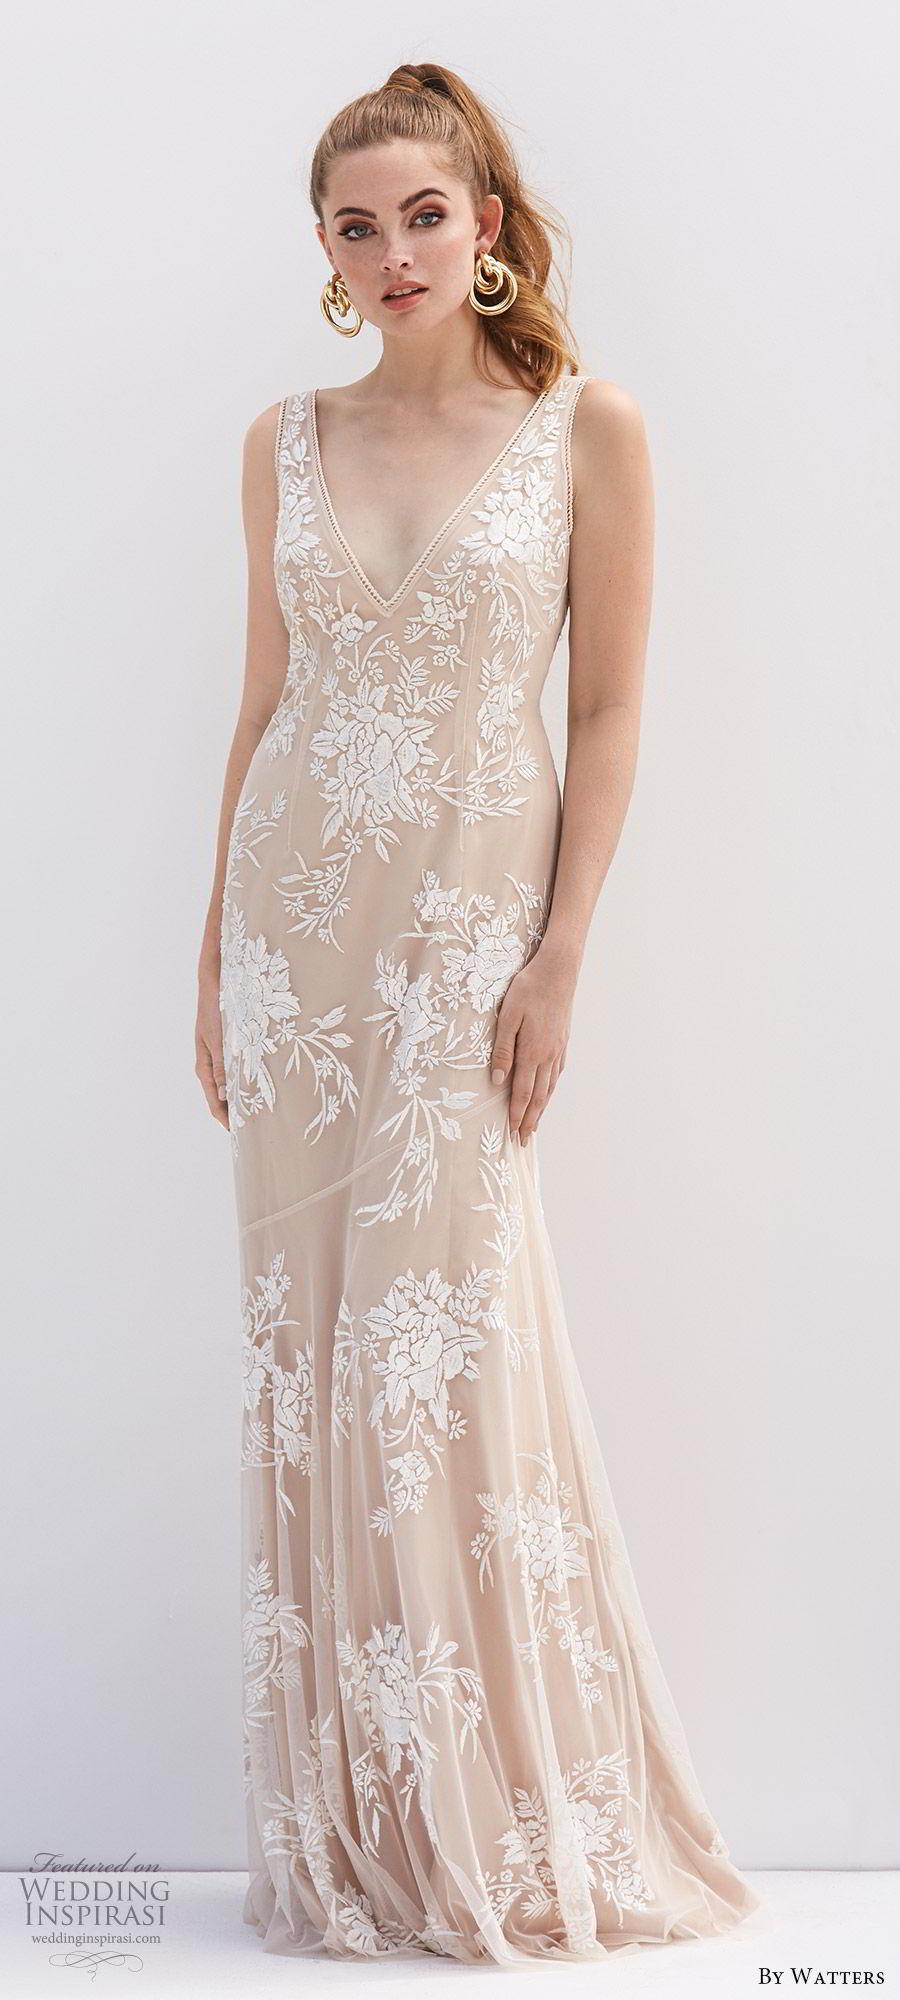 by watters 2020 bridal sleeveless deep v neck lace sheath wedding dress (5) v back sweep train champagne blush color elegant mv